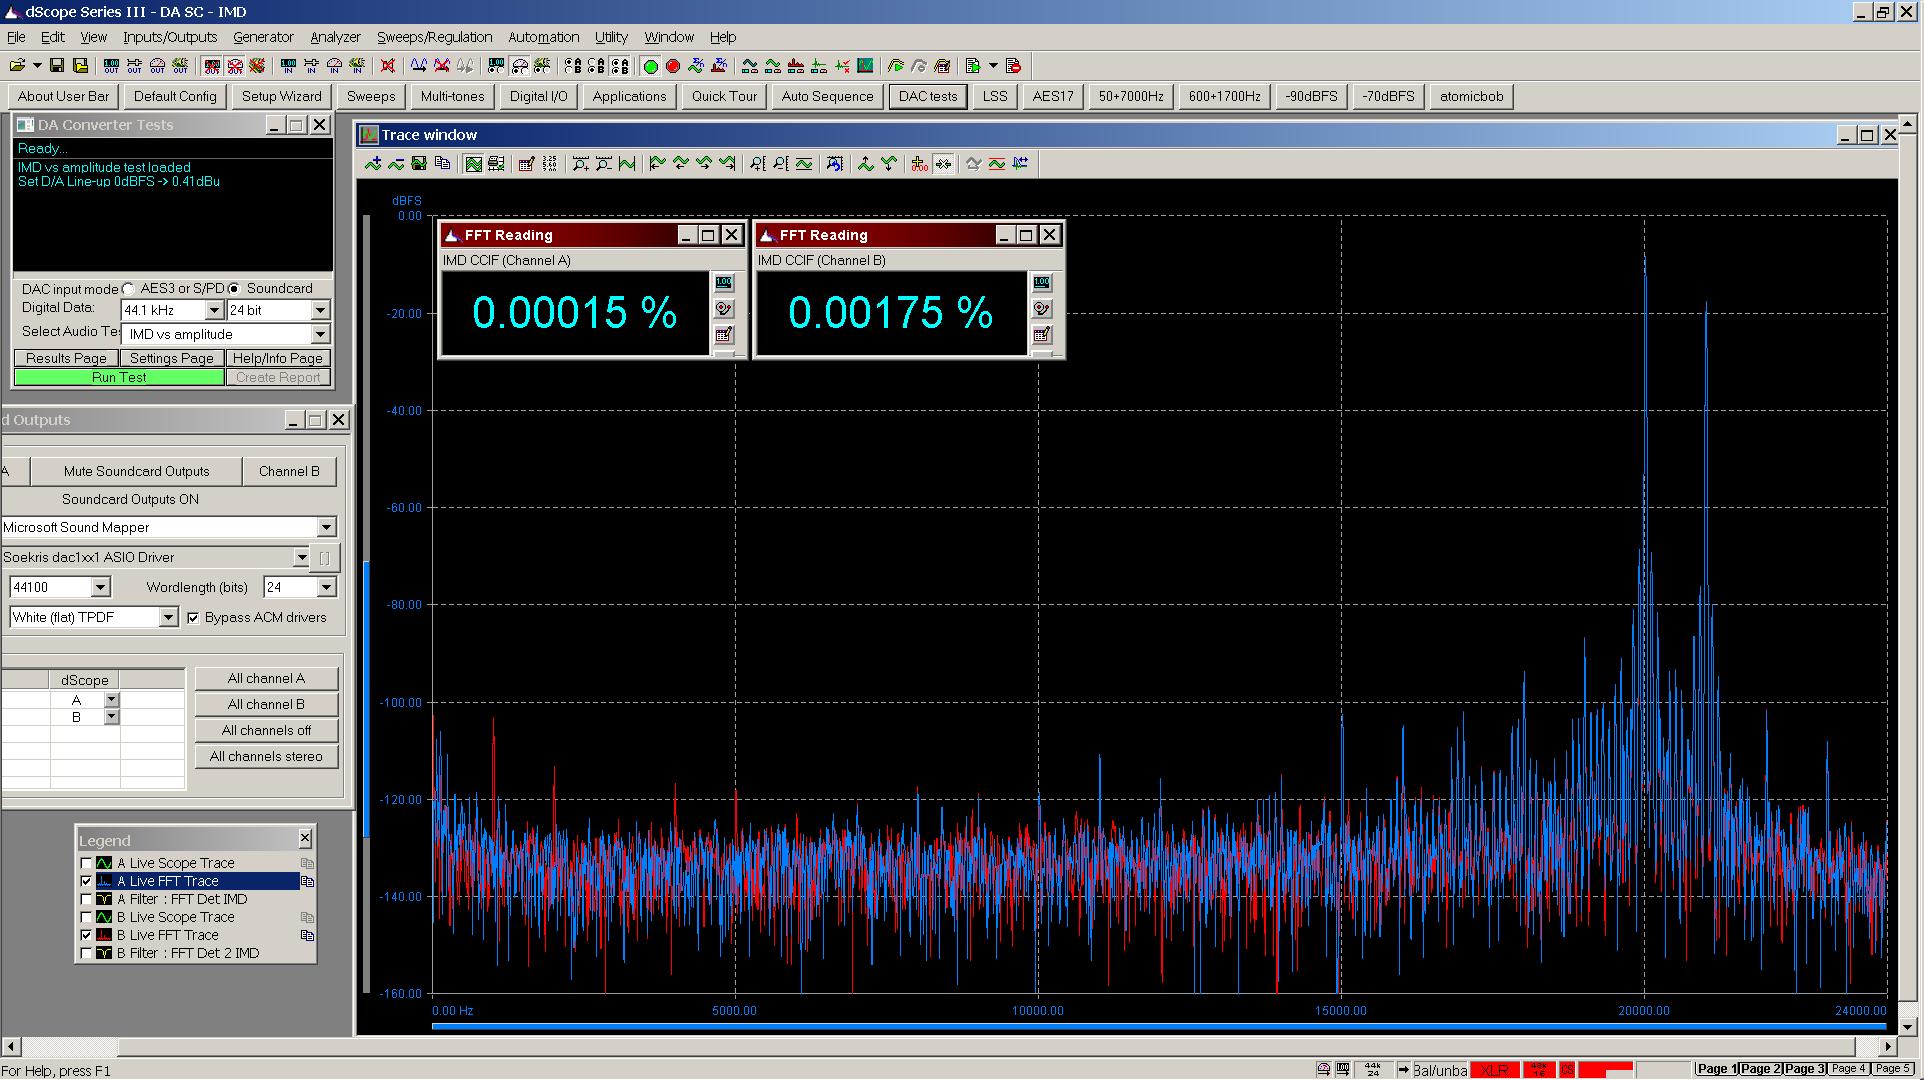 07 Bal IMD spectrum 30R.PNG